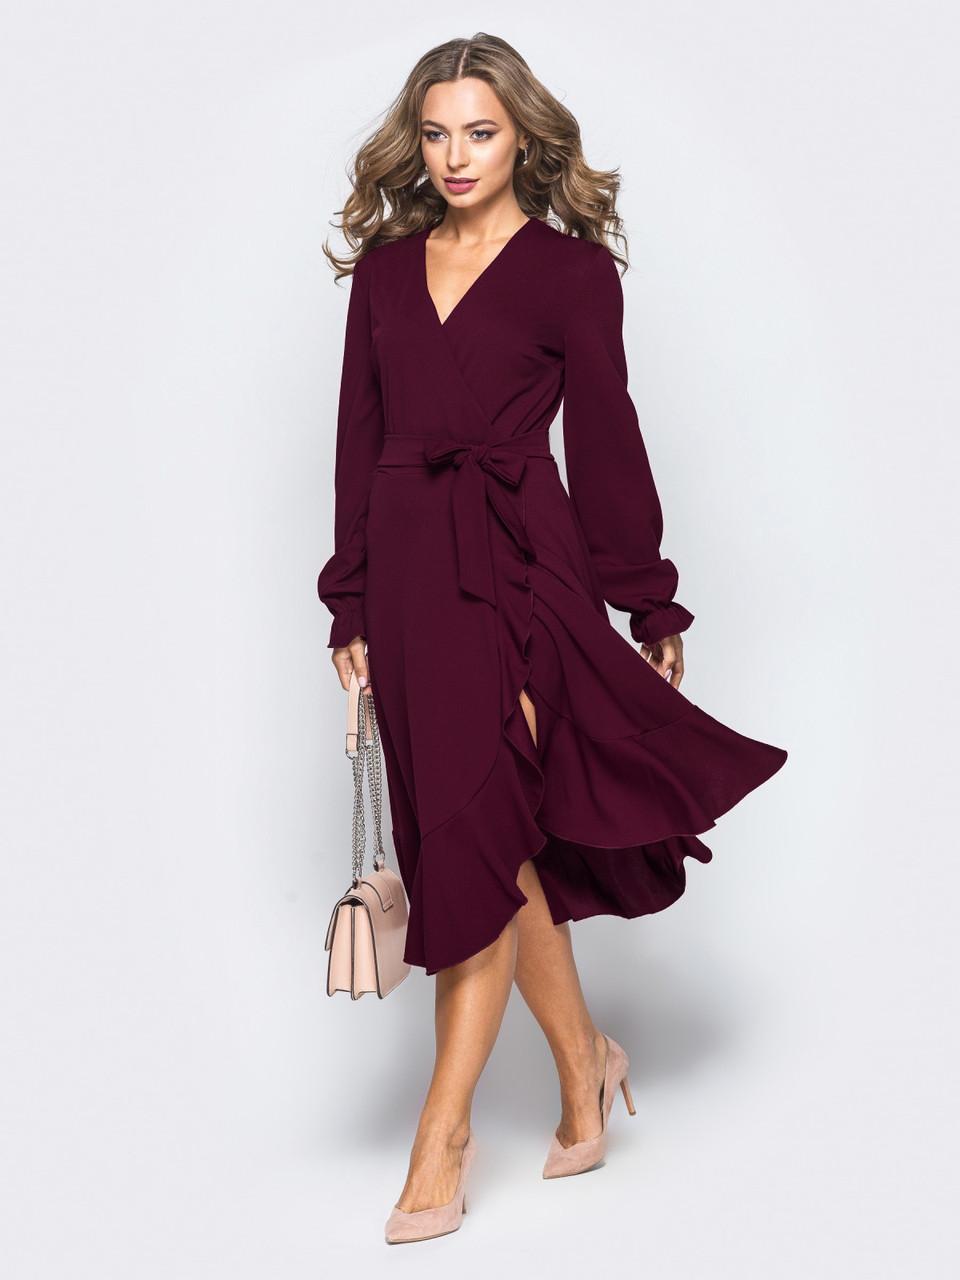 0d614c5b01b65f5 Красивое бордовое платье-миди на запах с мягким воланом по низу р.42 ...